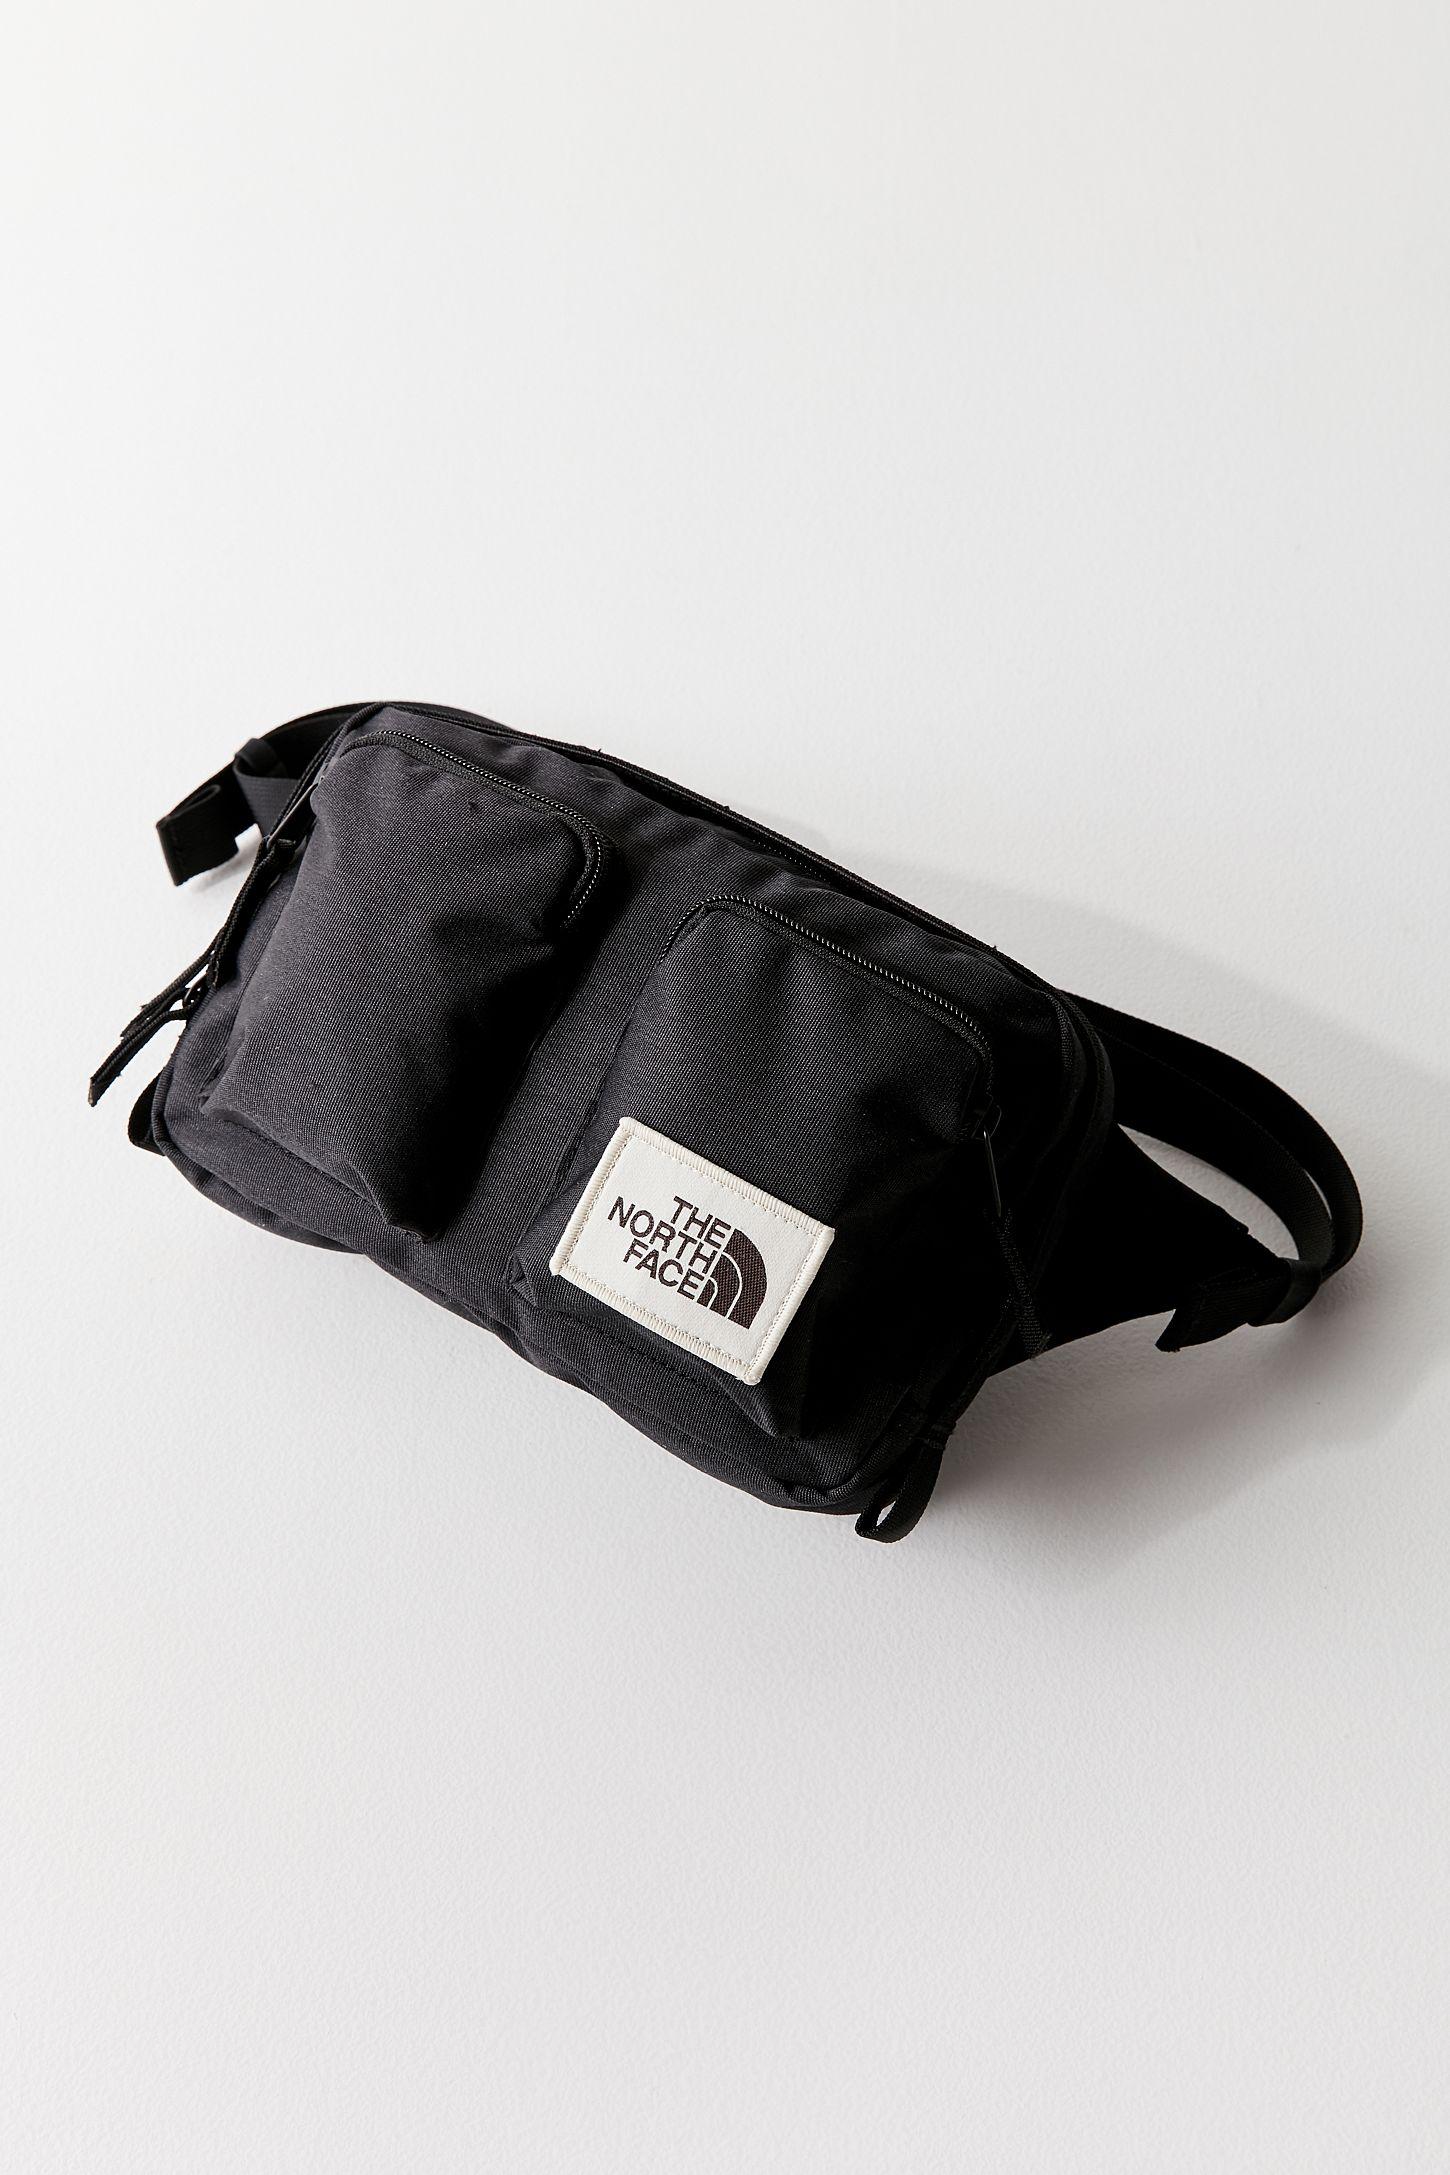 ebf9f5586 The North Face Kanga Belt Bag